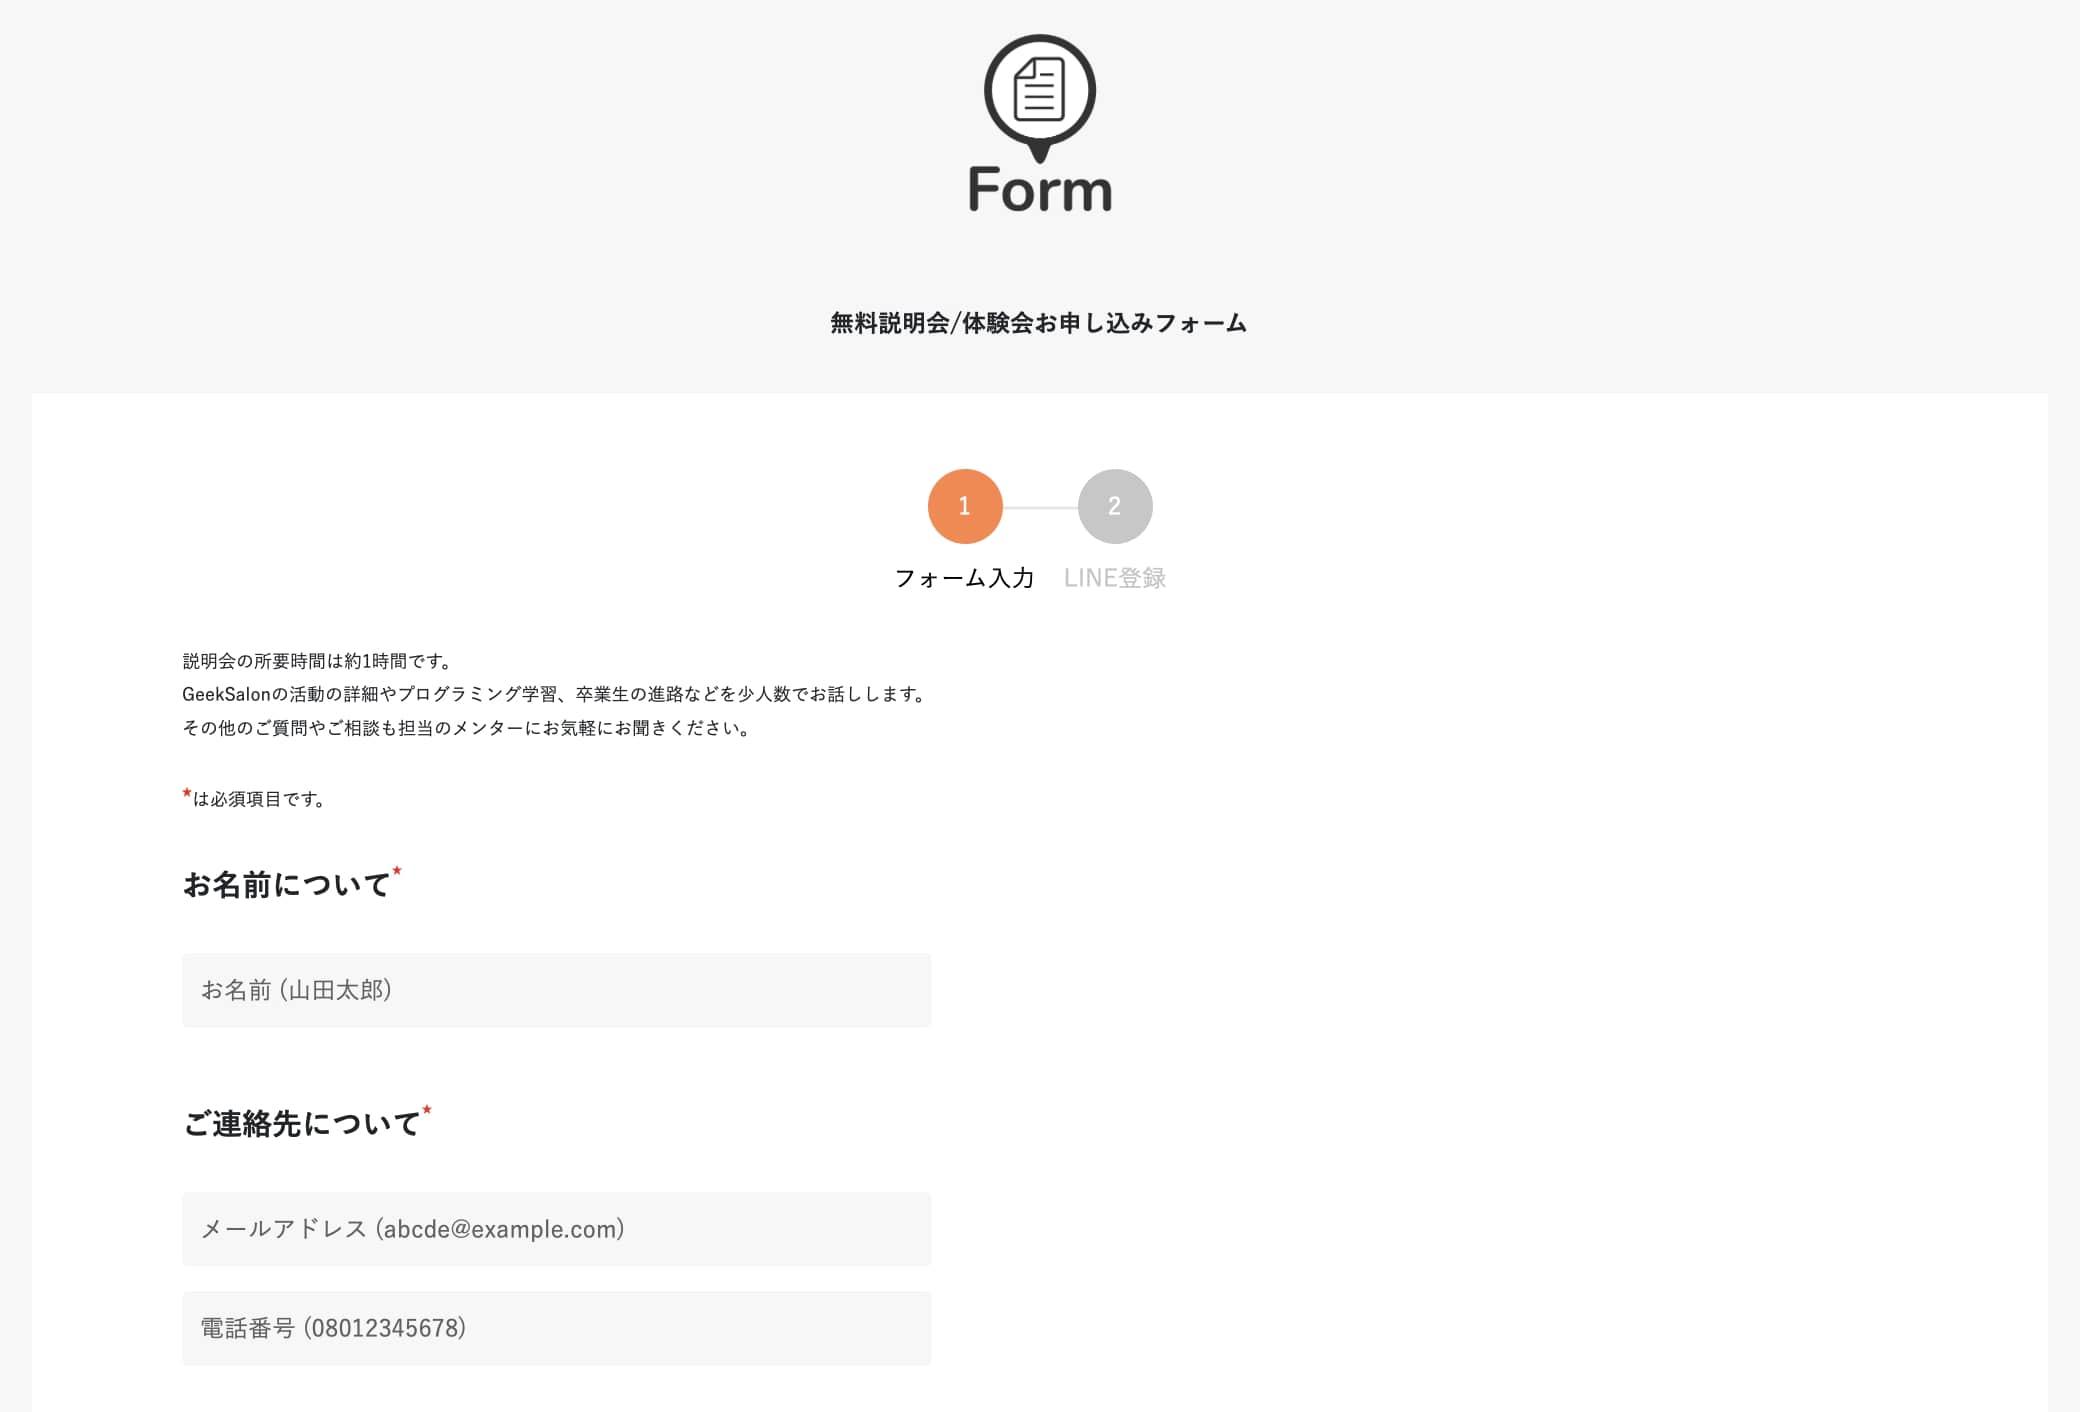 GeekSalonの無料説明会登録フォームNO1